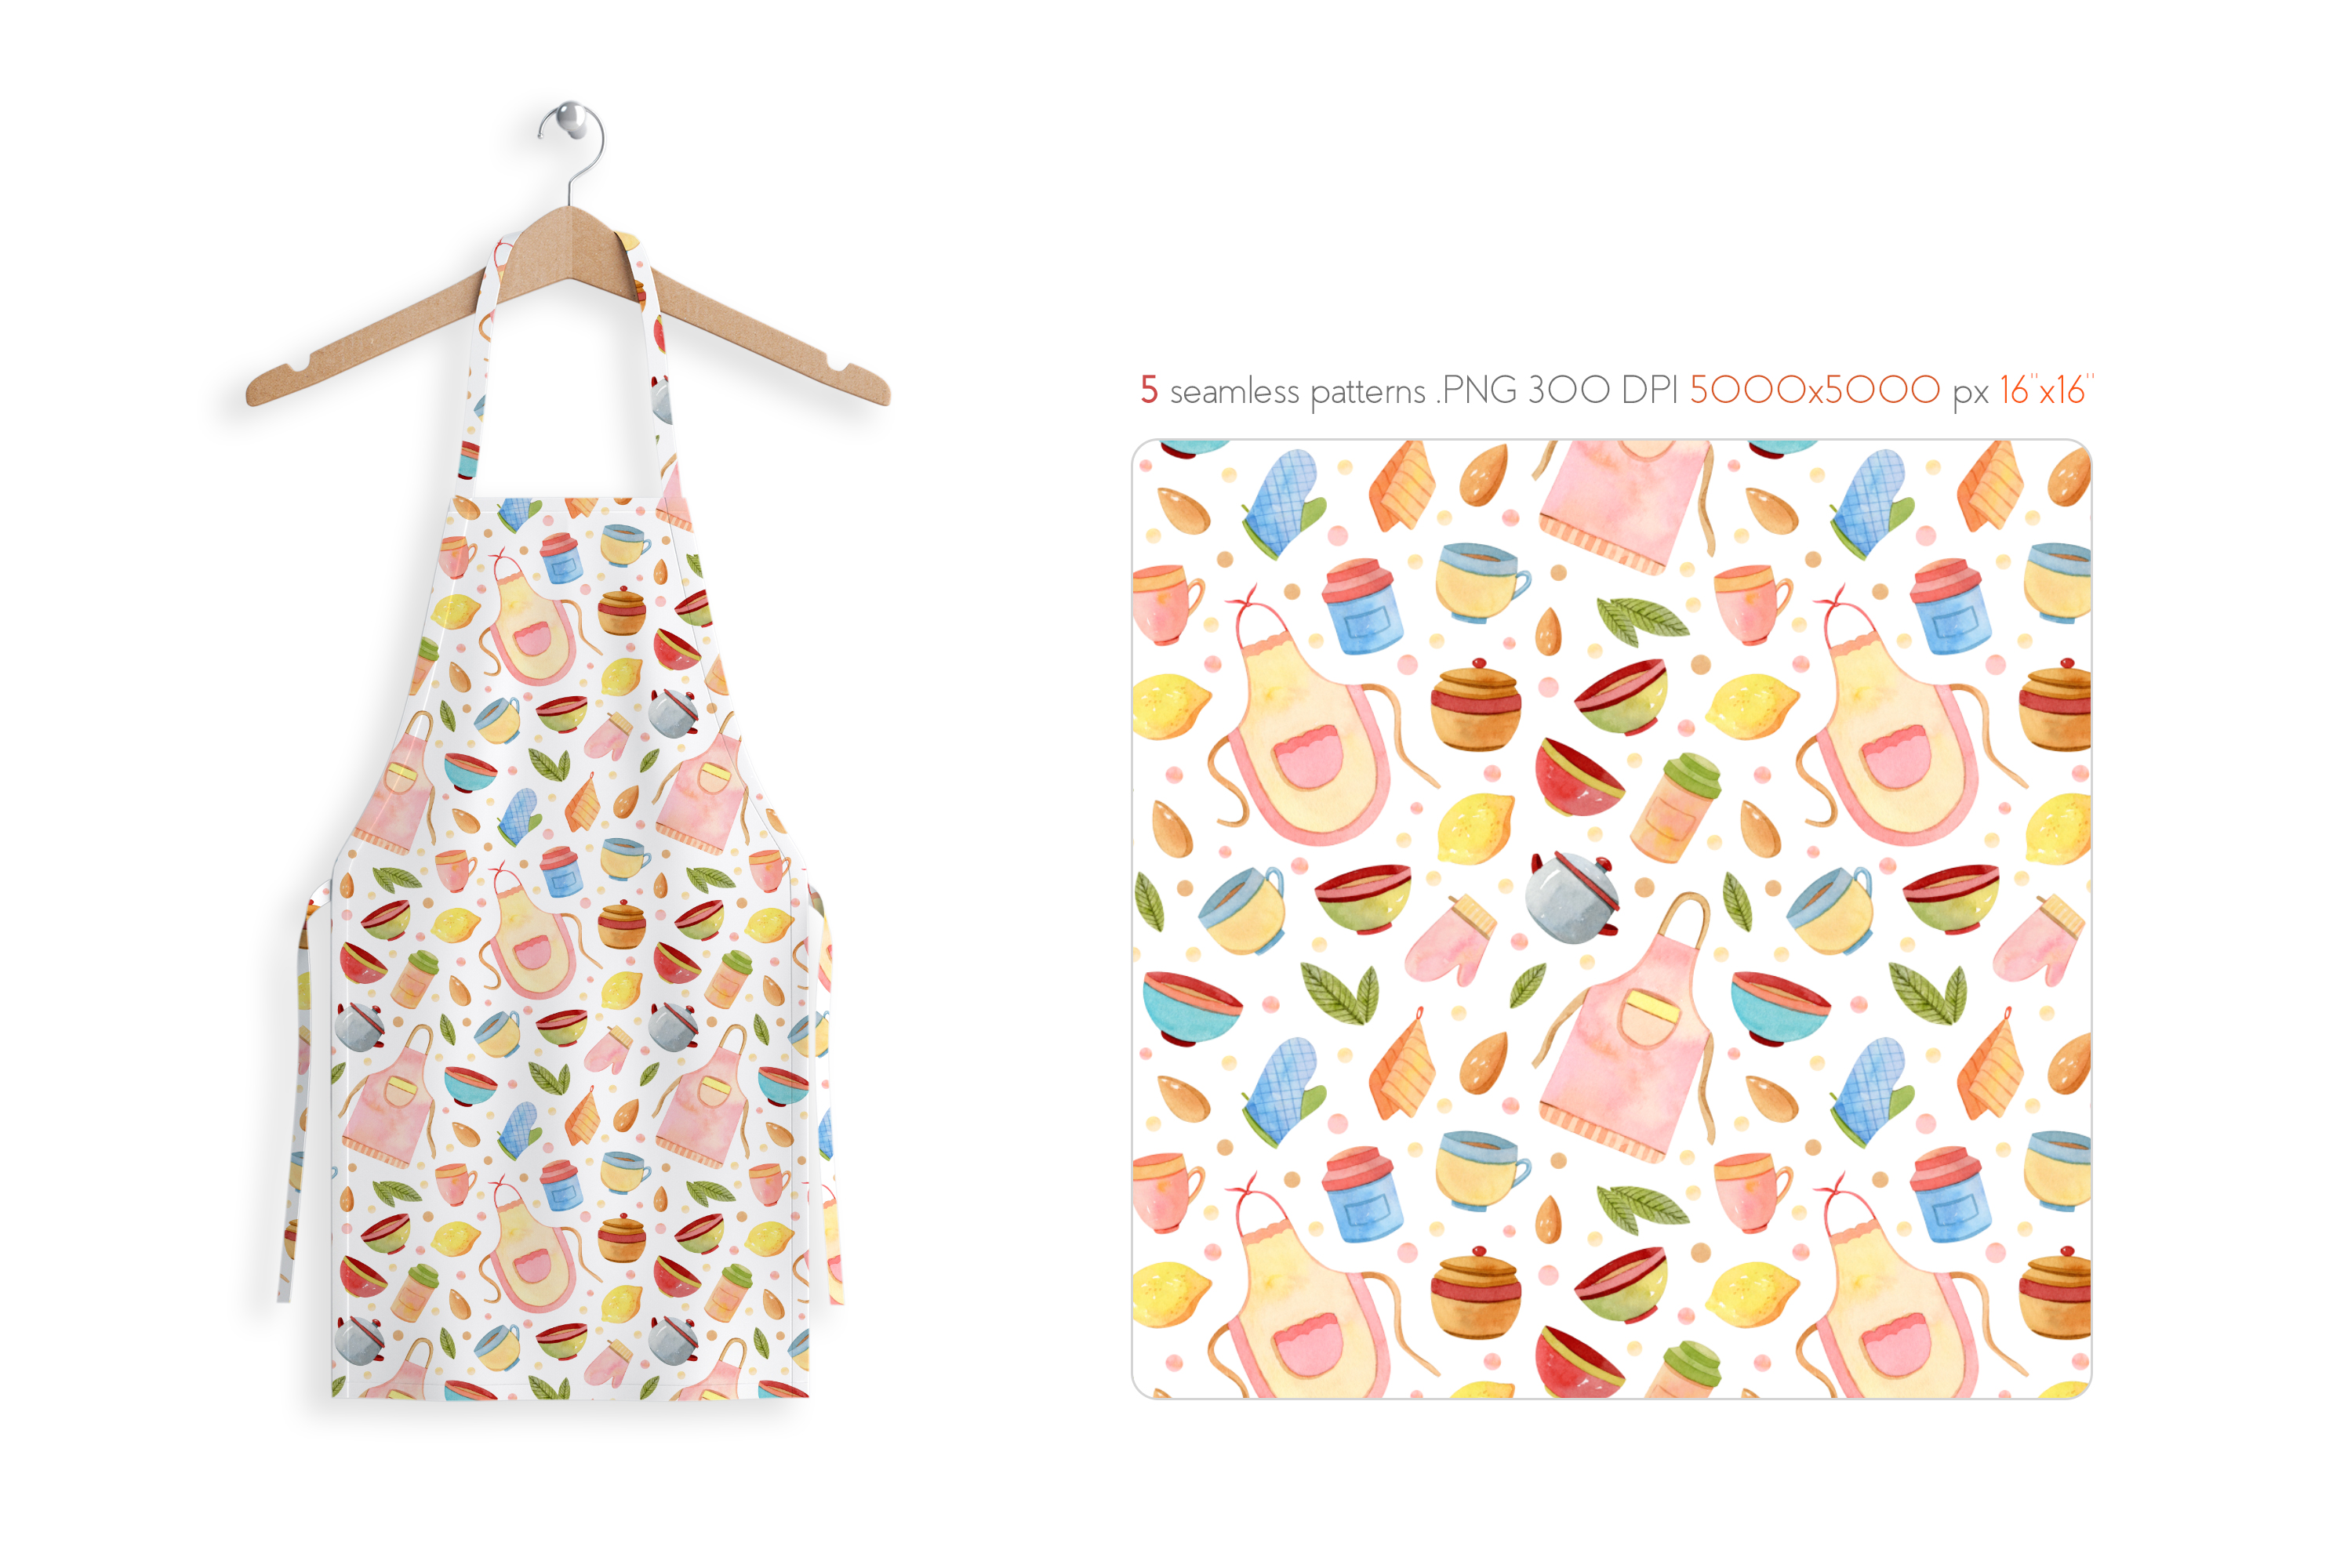 Watercolor Kitchen Utensils Set 2 example image 6